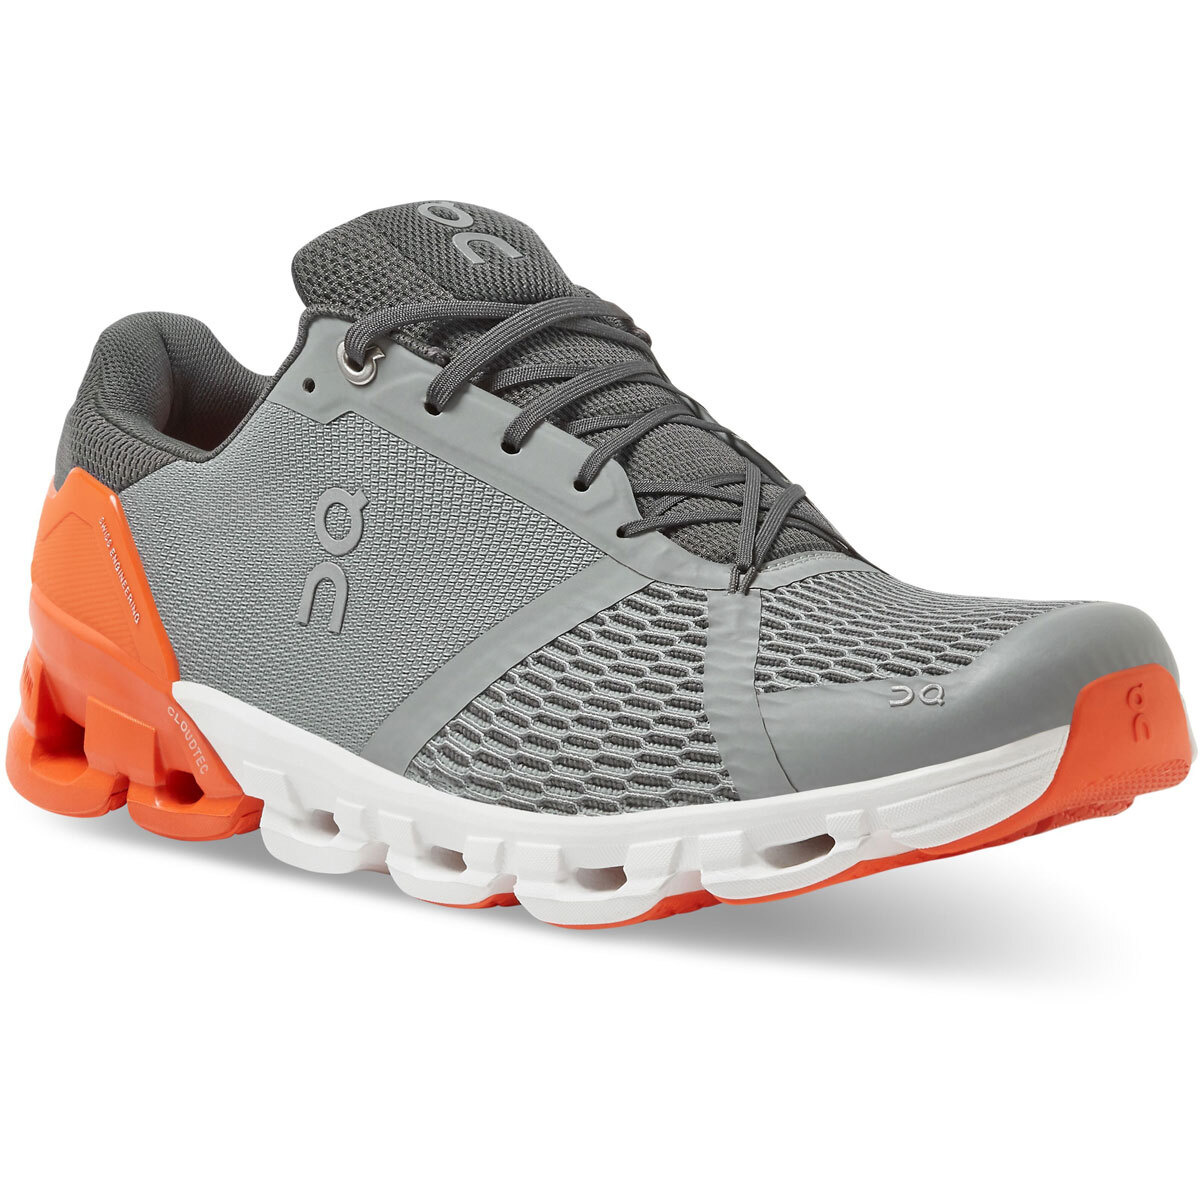 Men's On Cloudflyer 2.0 Running Shoe - Color: Grey/Orange - Size: 9 - Width: Regular, Grey/Orange, large, image 2